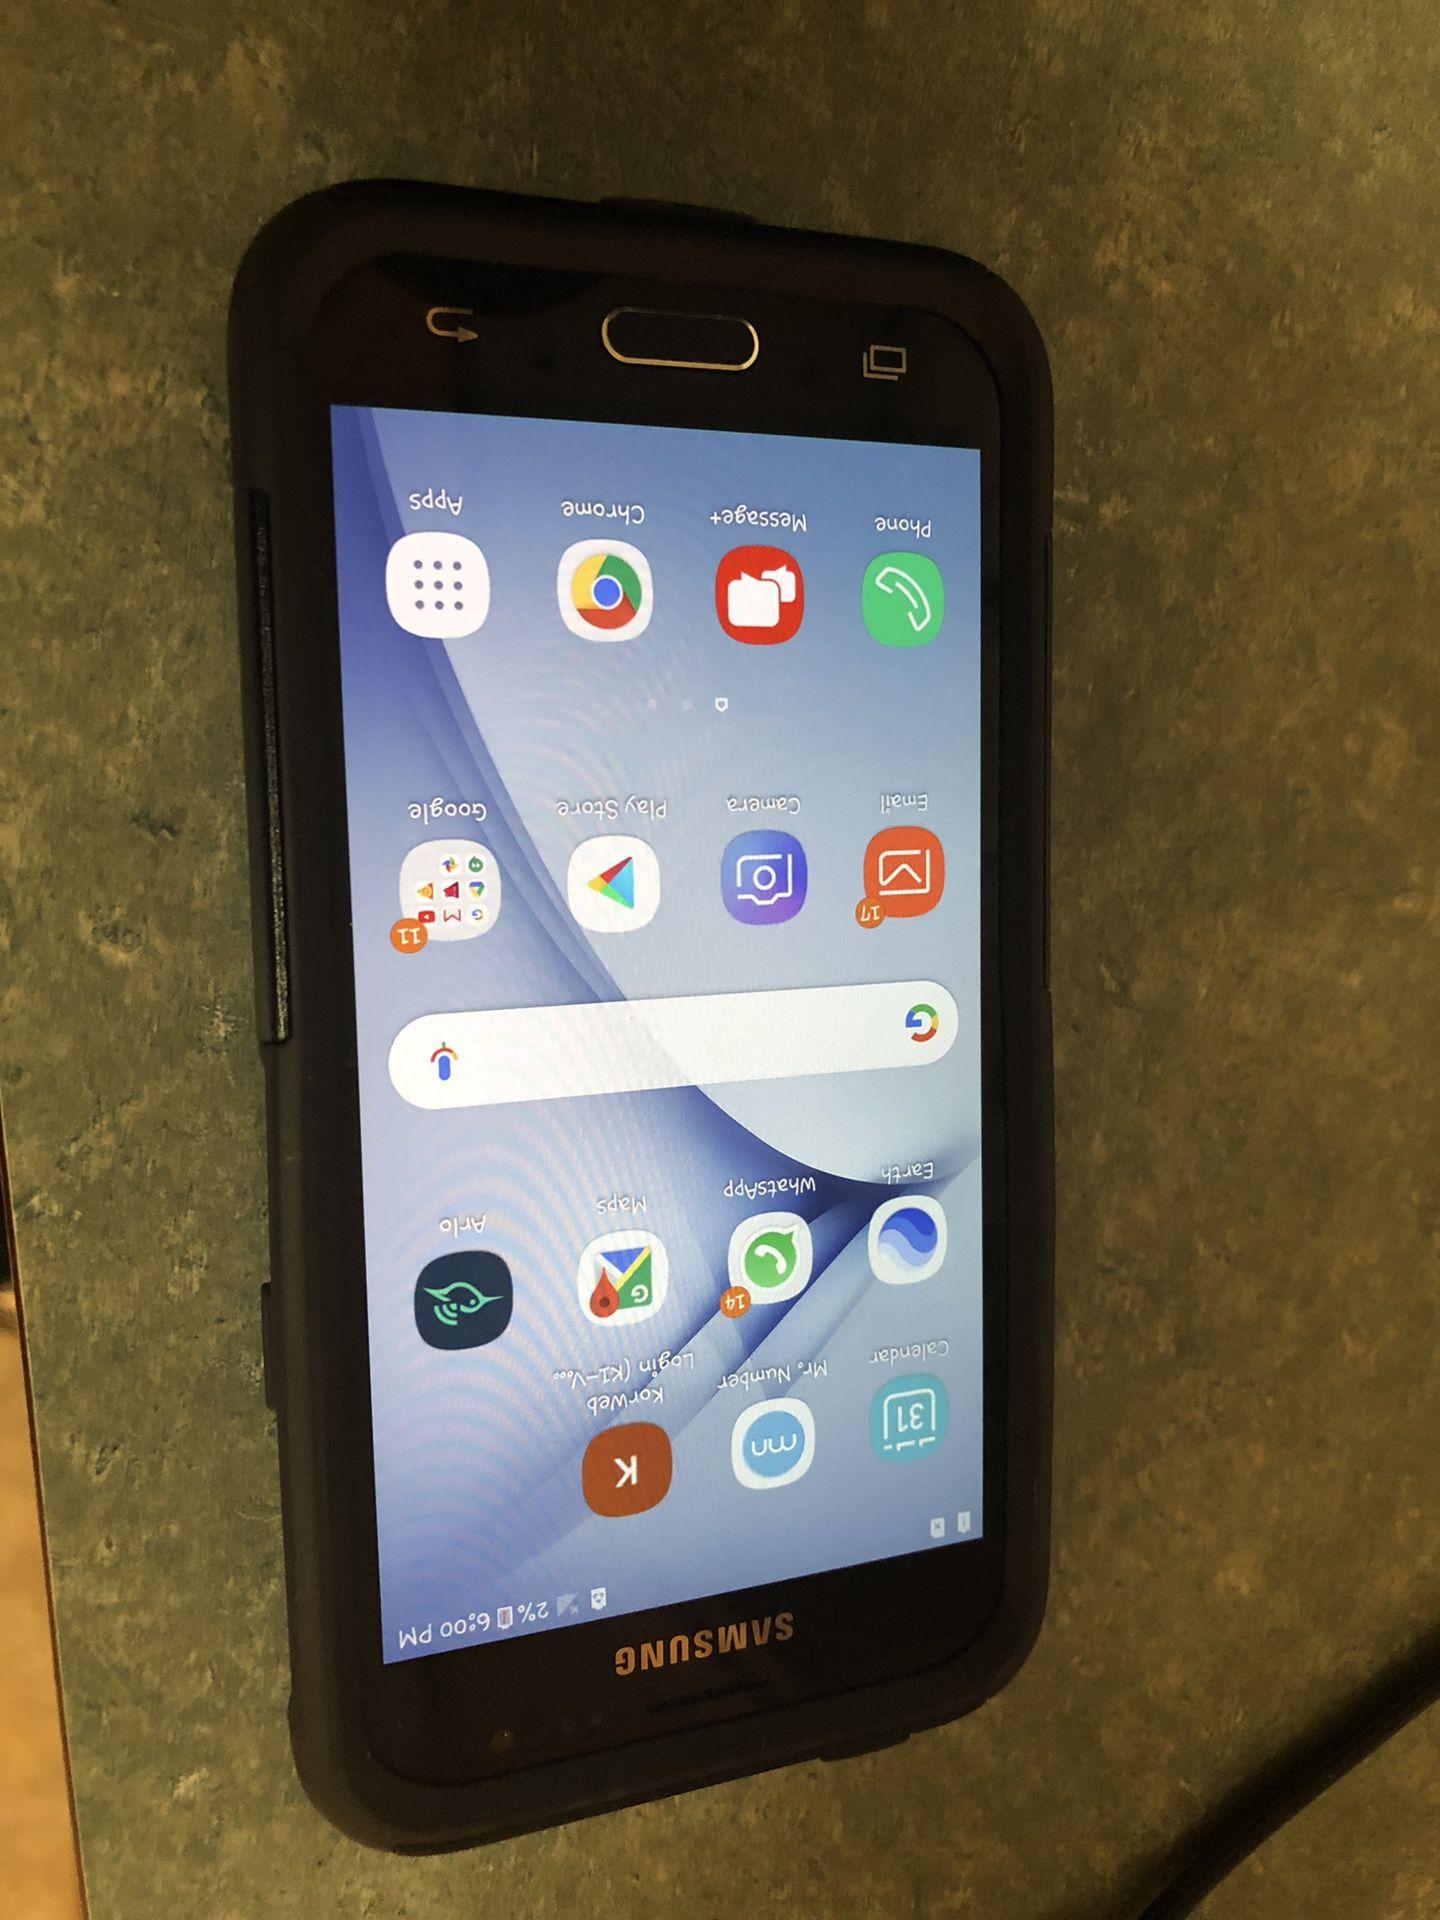 Verizon Samsung cell phone